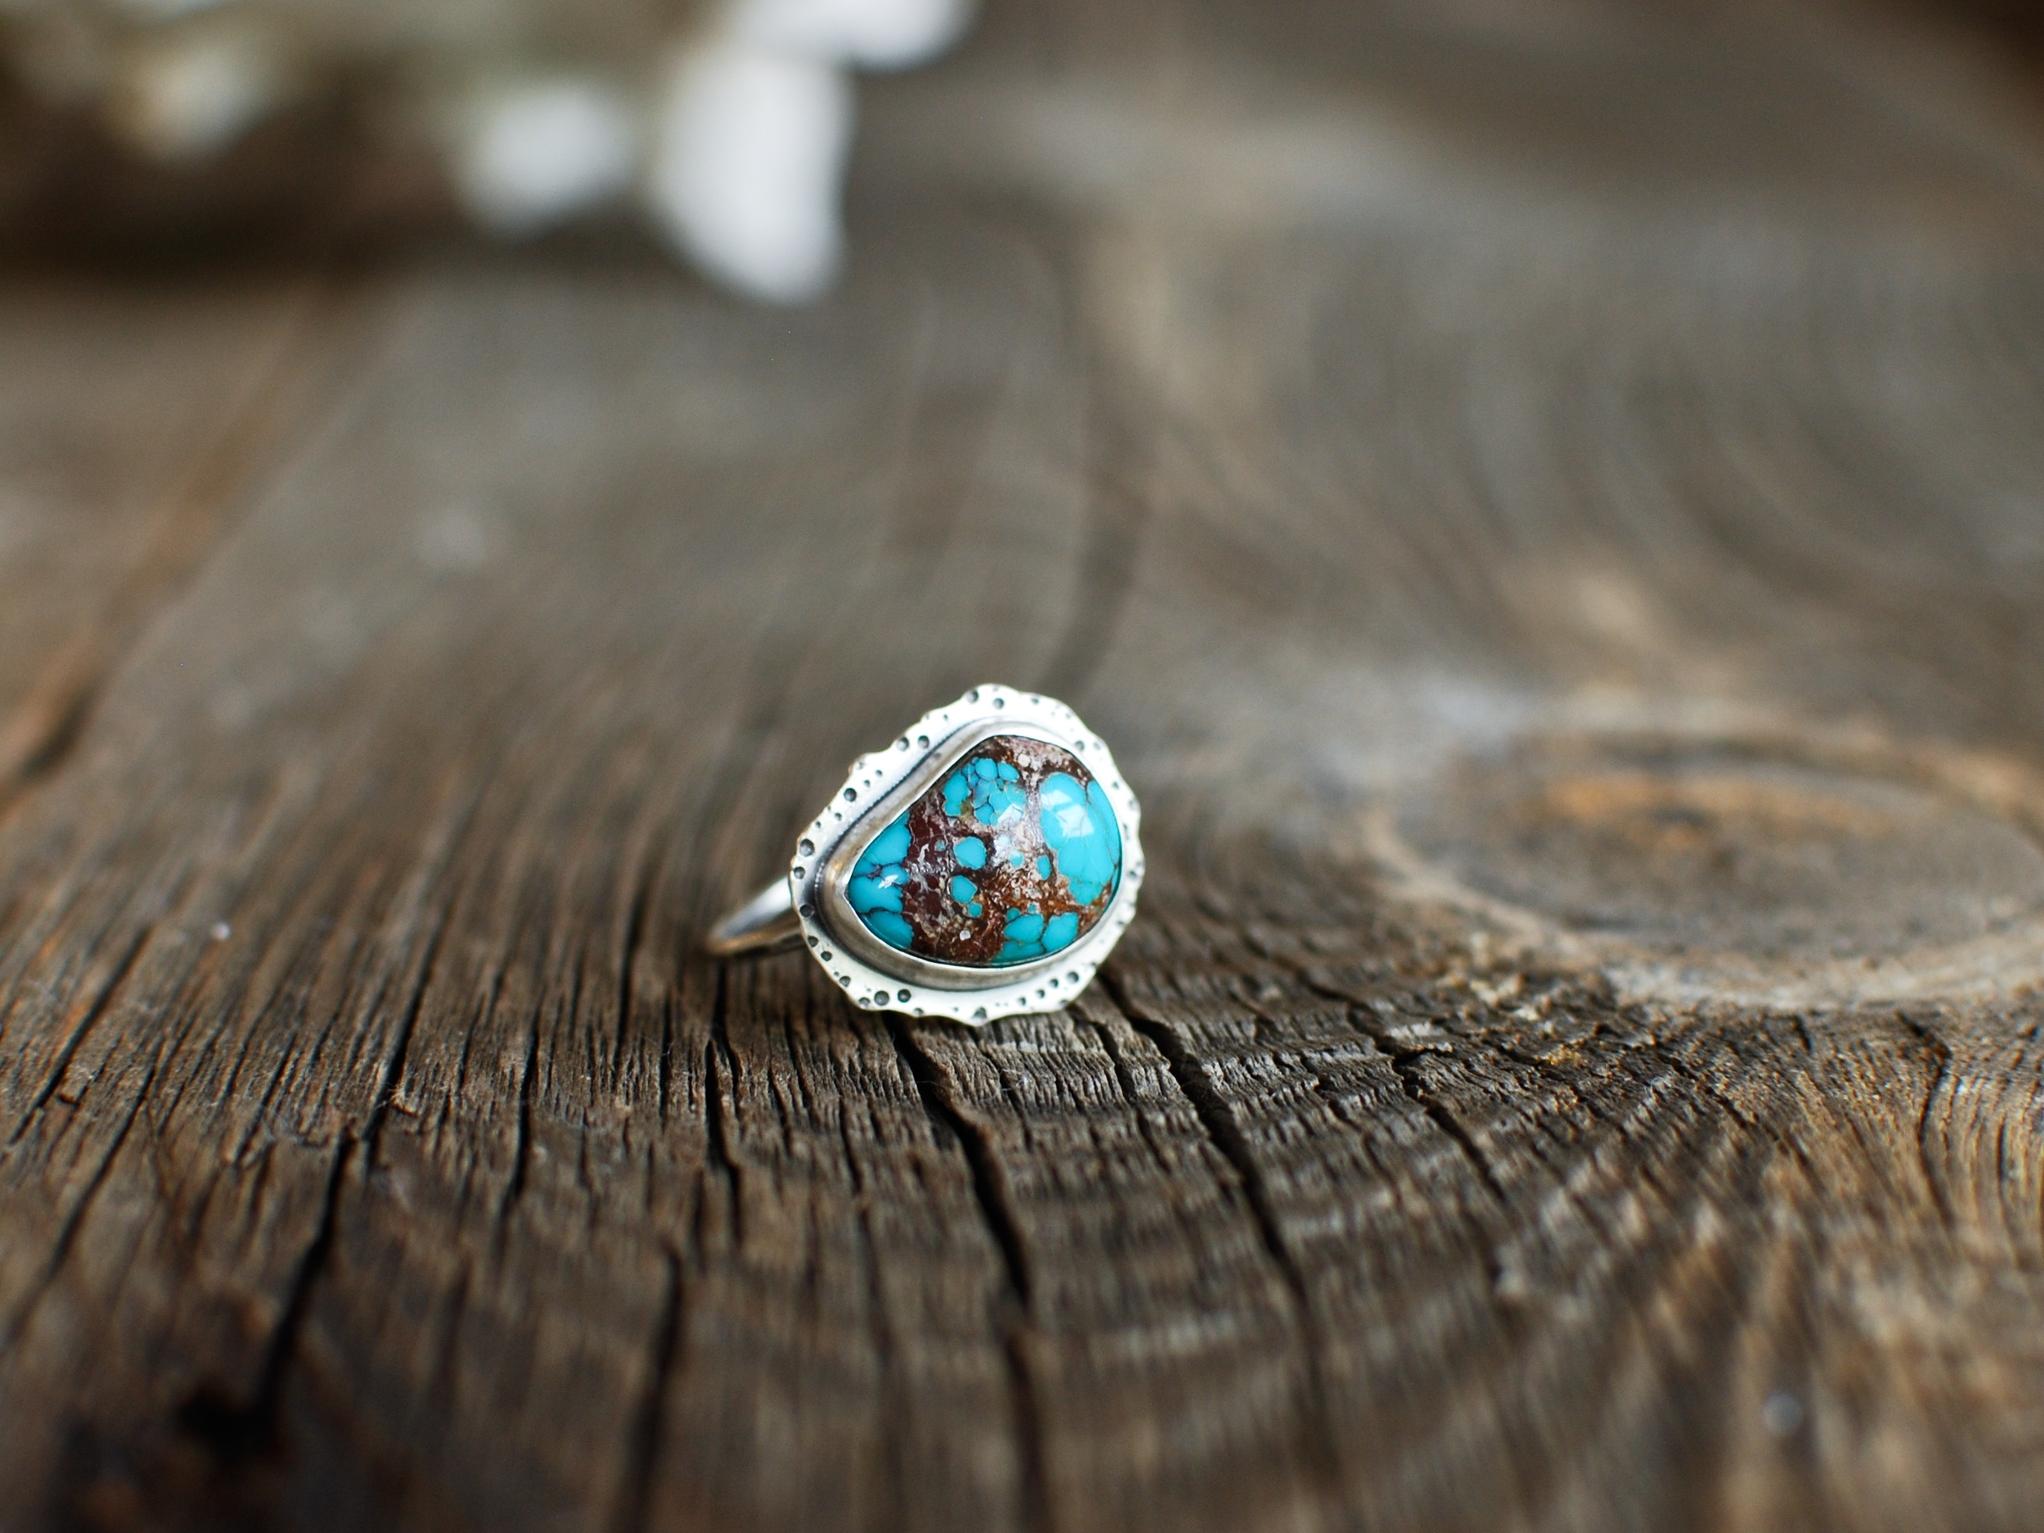 ring speckled3-0064.jpg